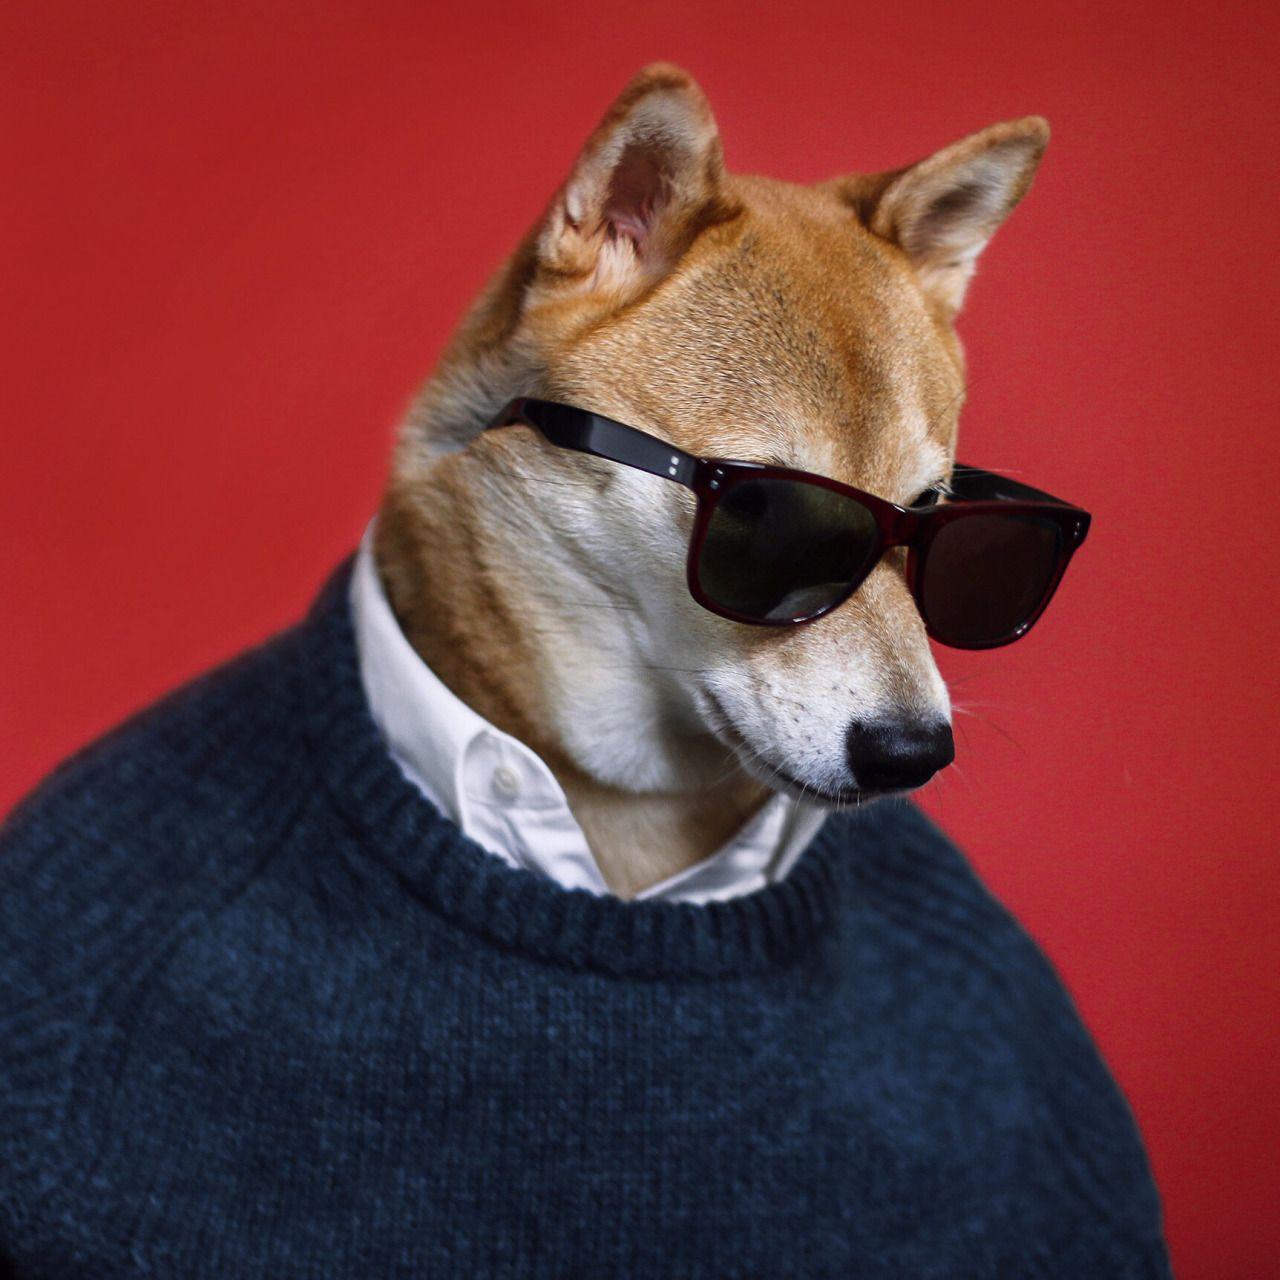 Pin By Gonobobel On Shiba Menswear Dog Stylish Dogs Dogs